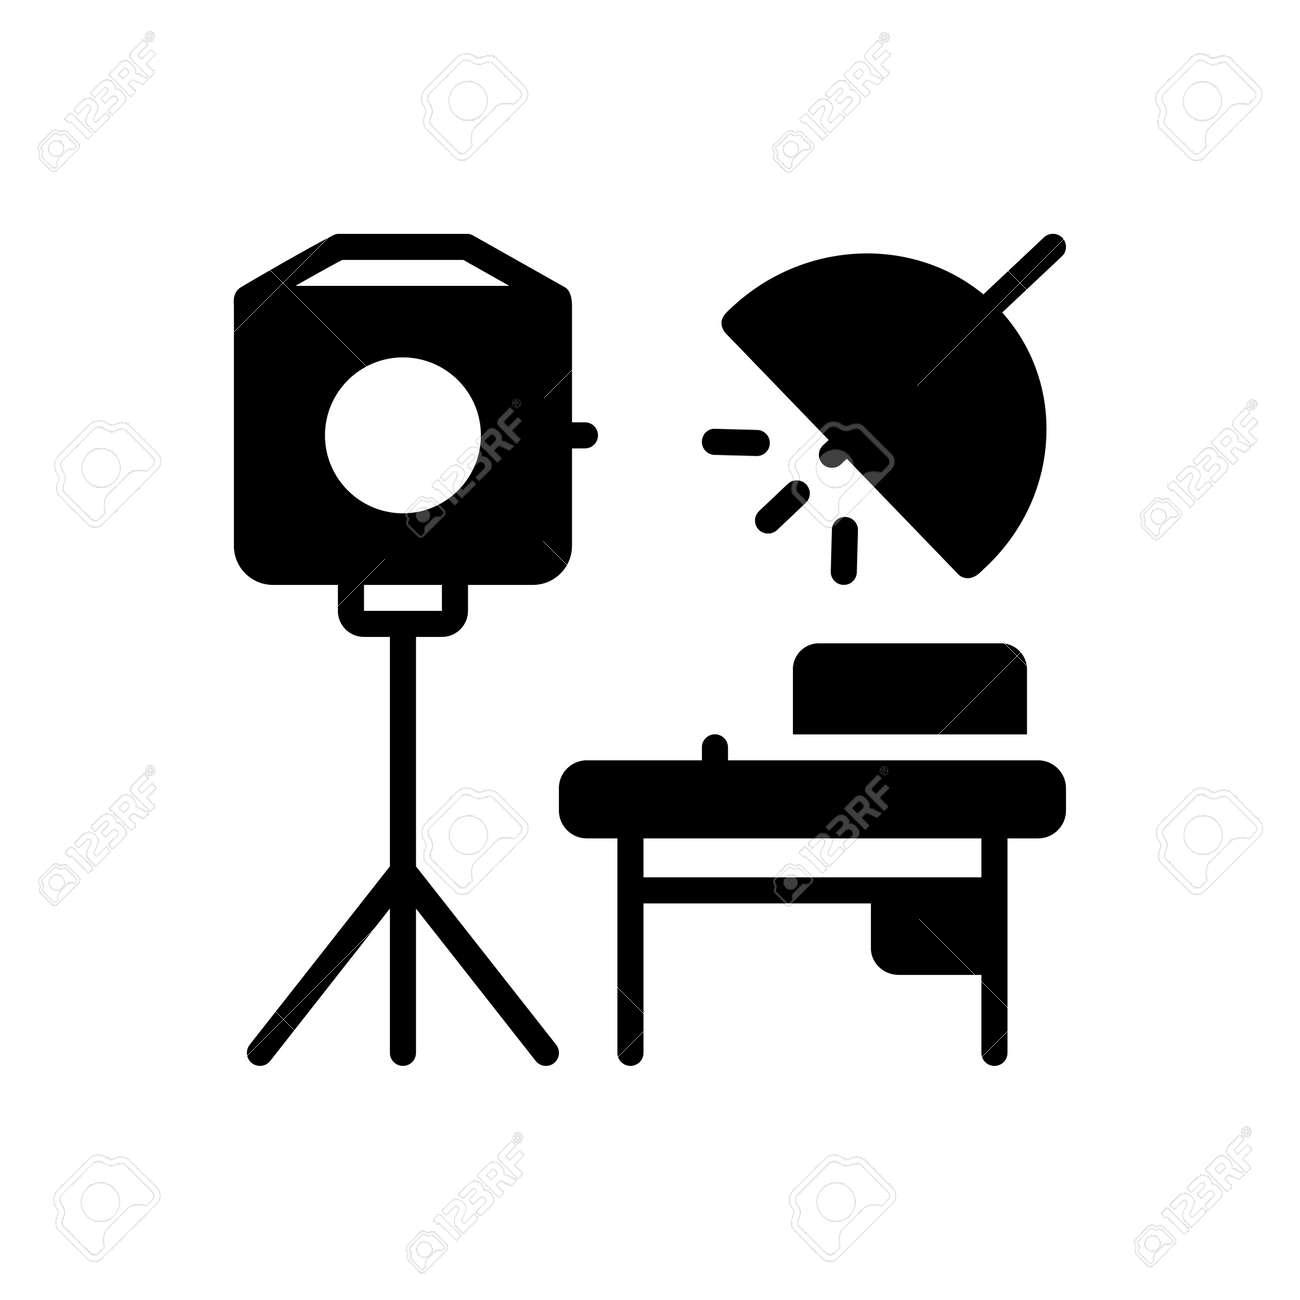 Icon for studio,photography - 172215104